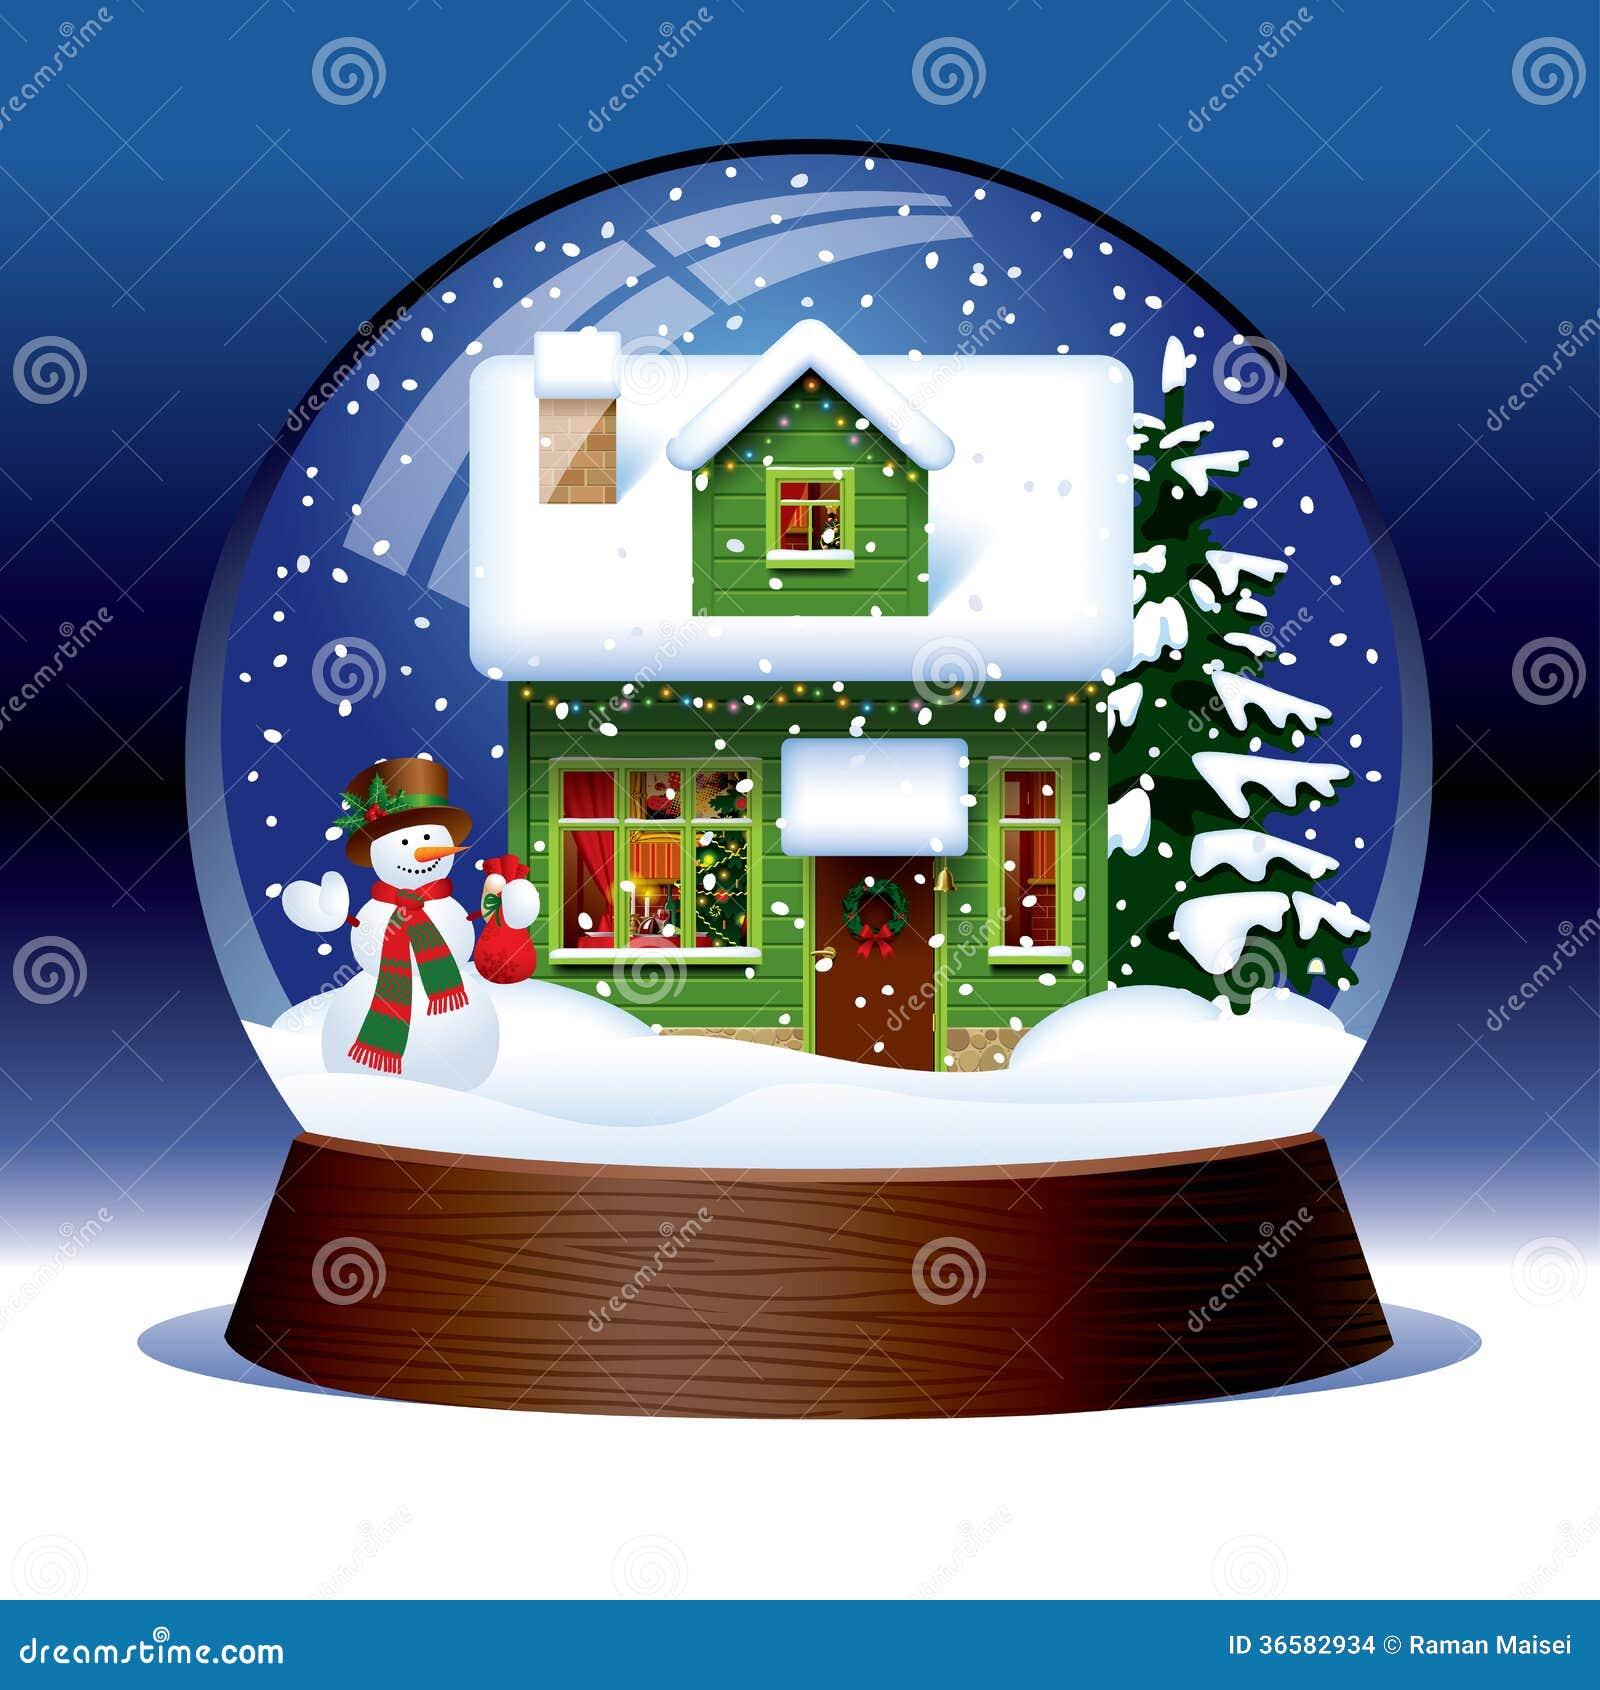 Snow Globe Stock Vector. Illustration Of Card, Wooden